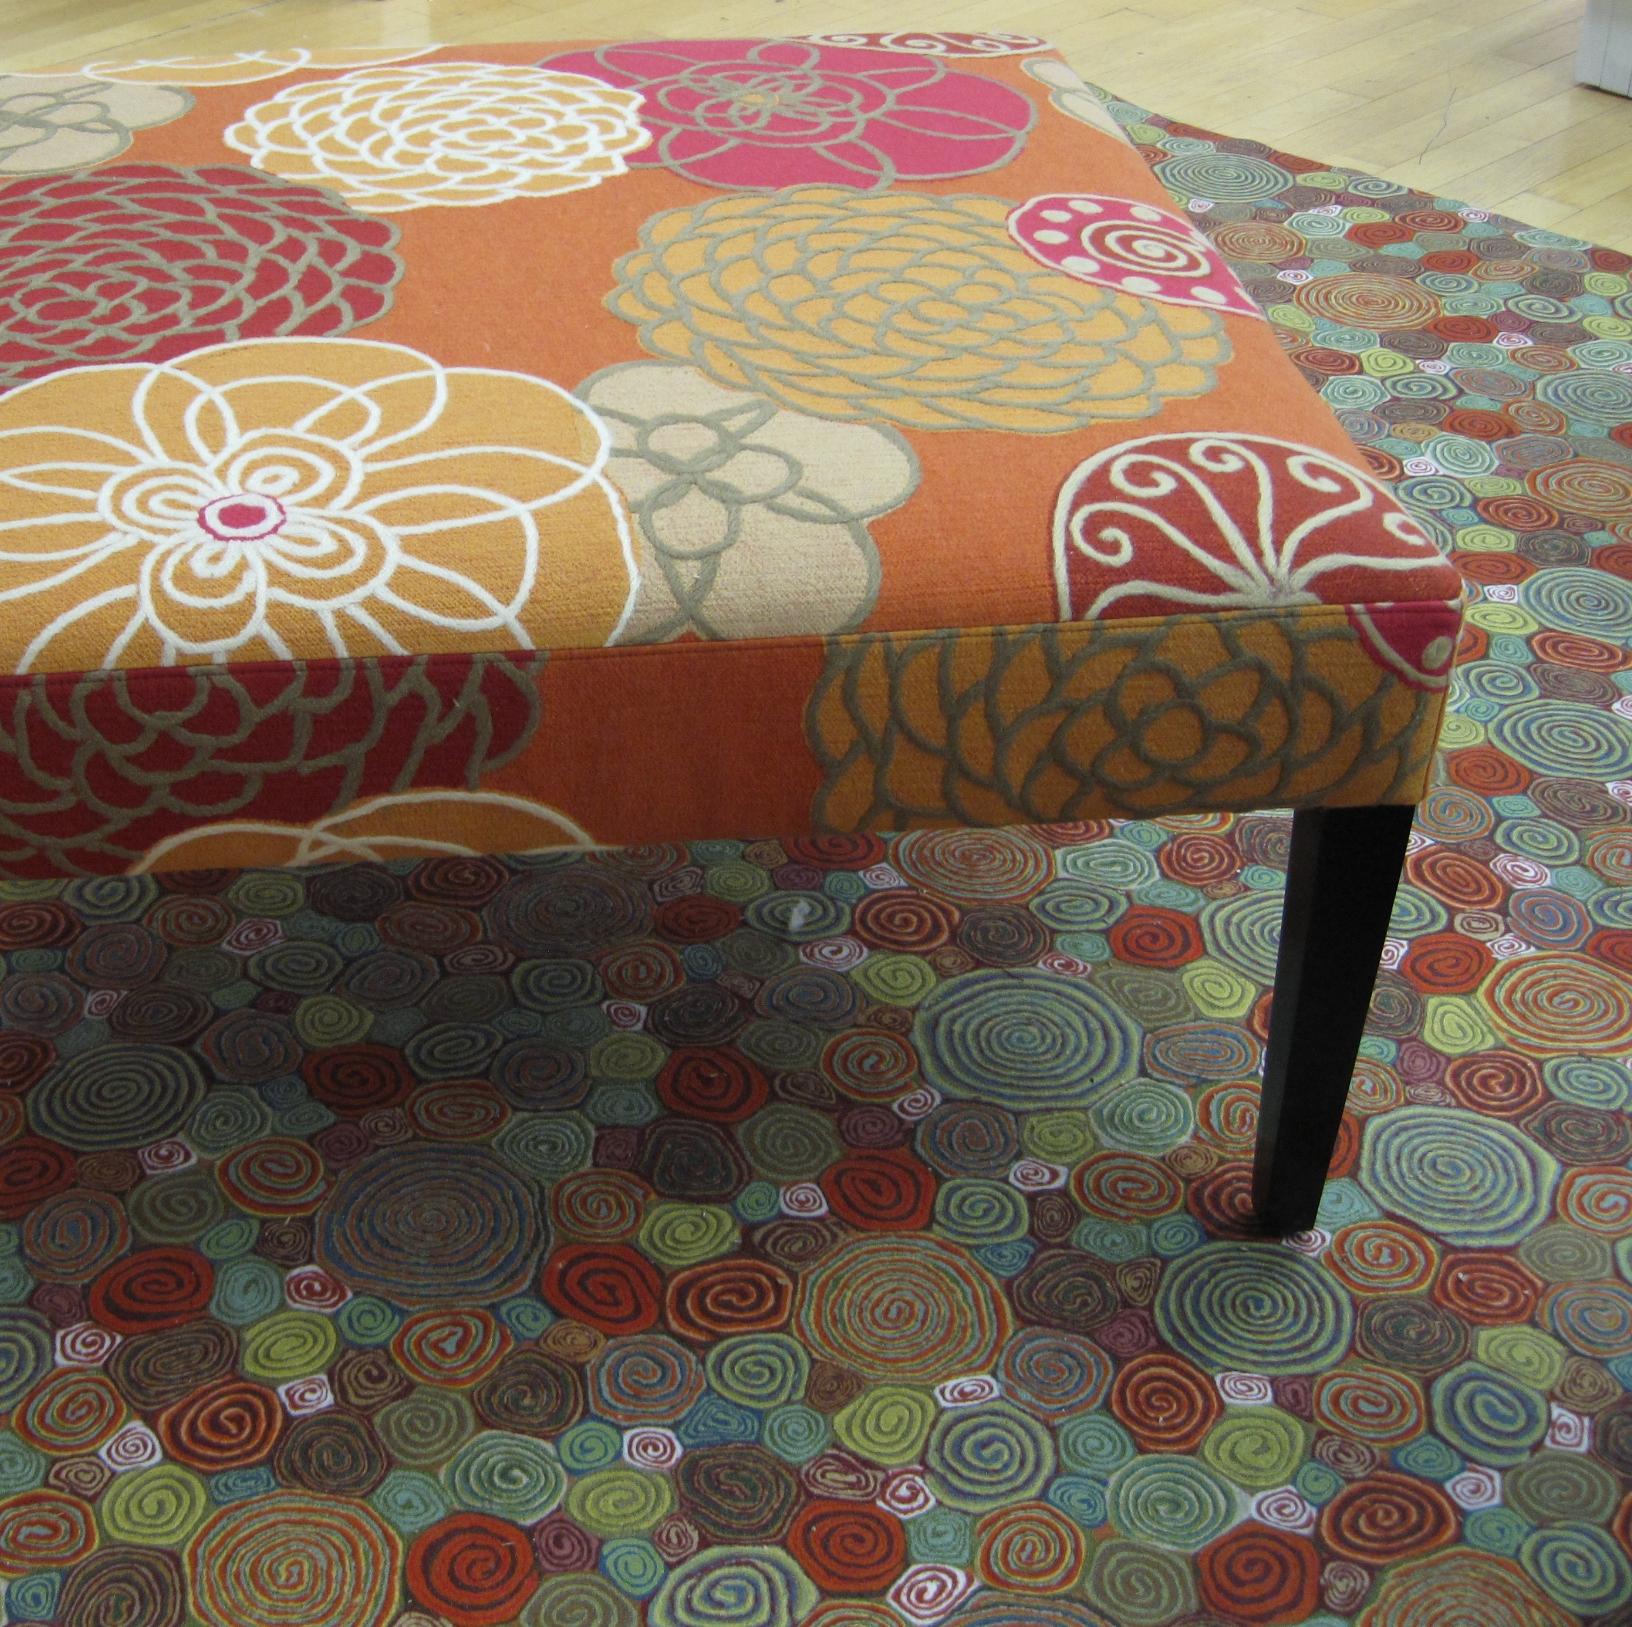 textile designer liora manne comes to charlotte  tamara heather  - liora manne thumbnail image